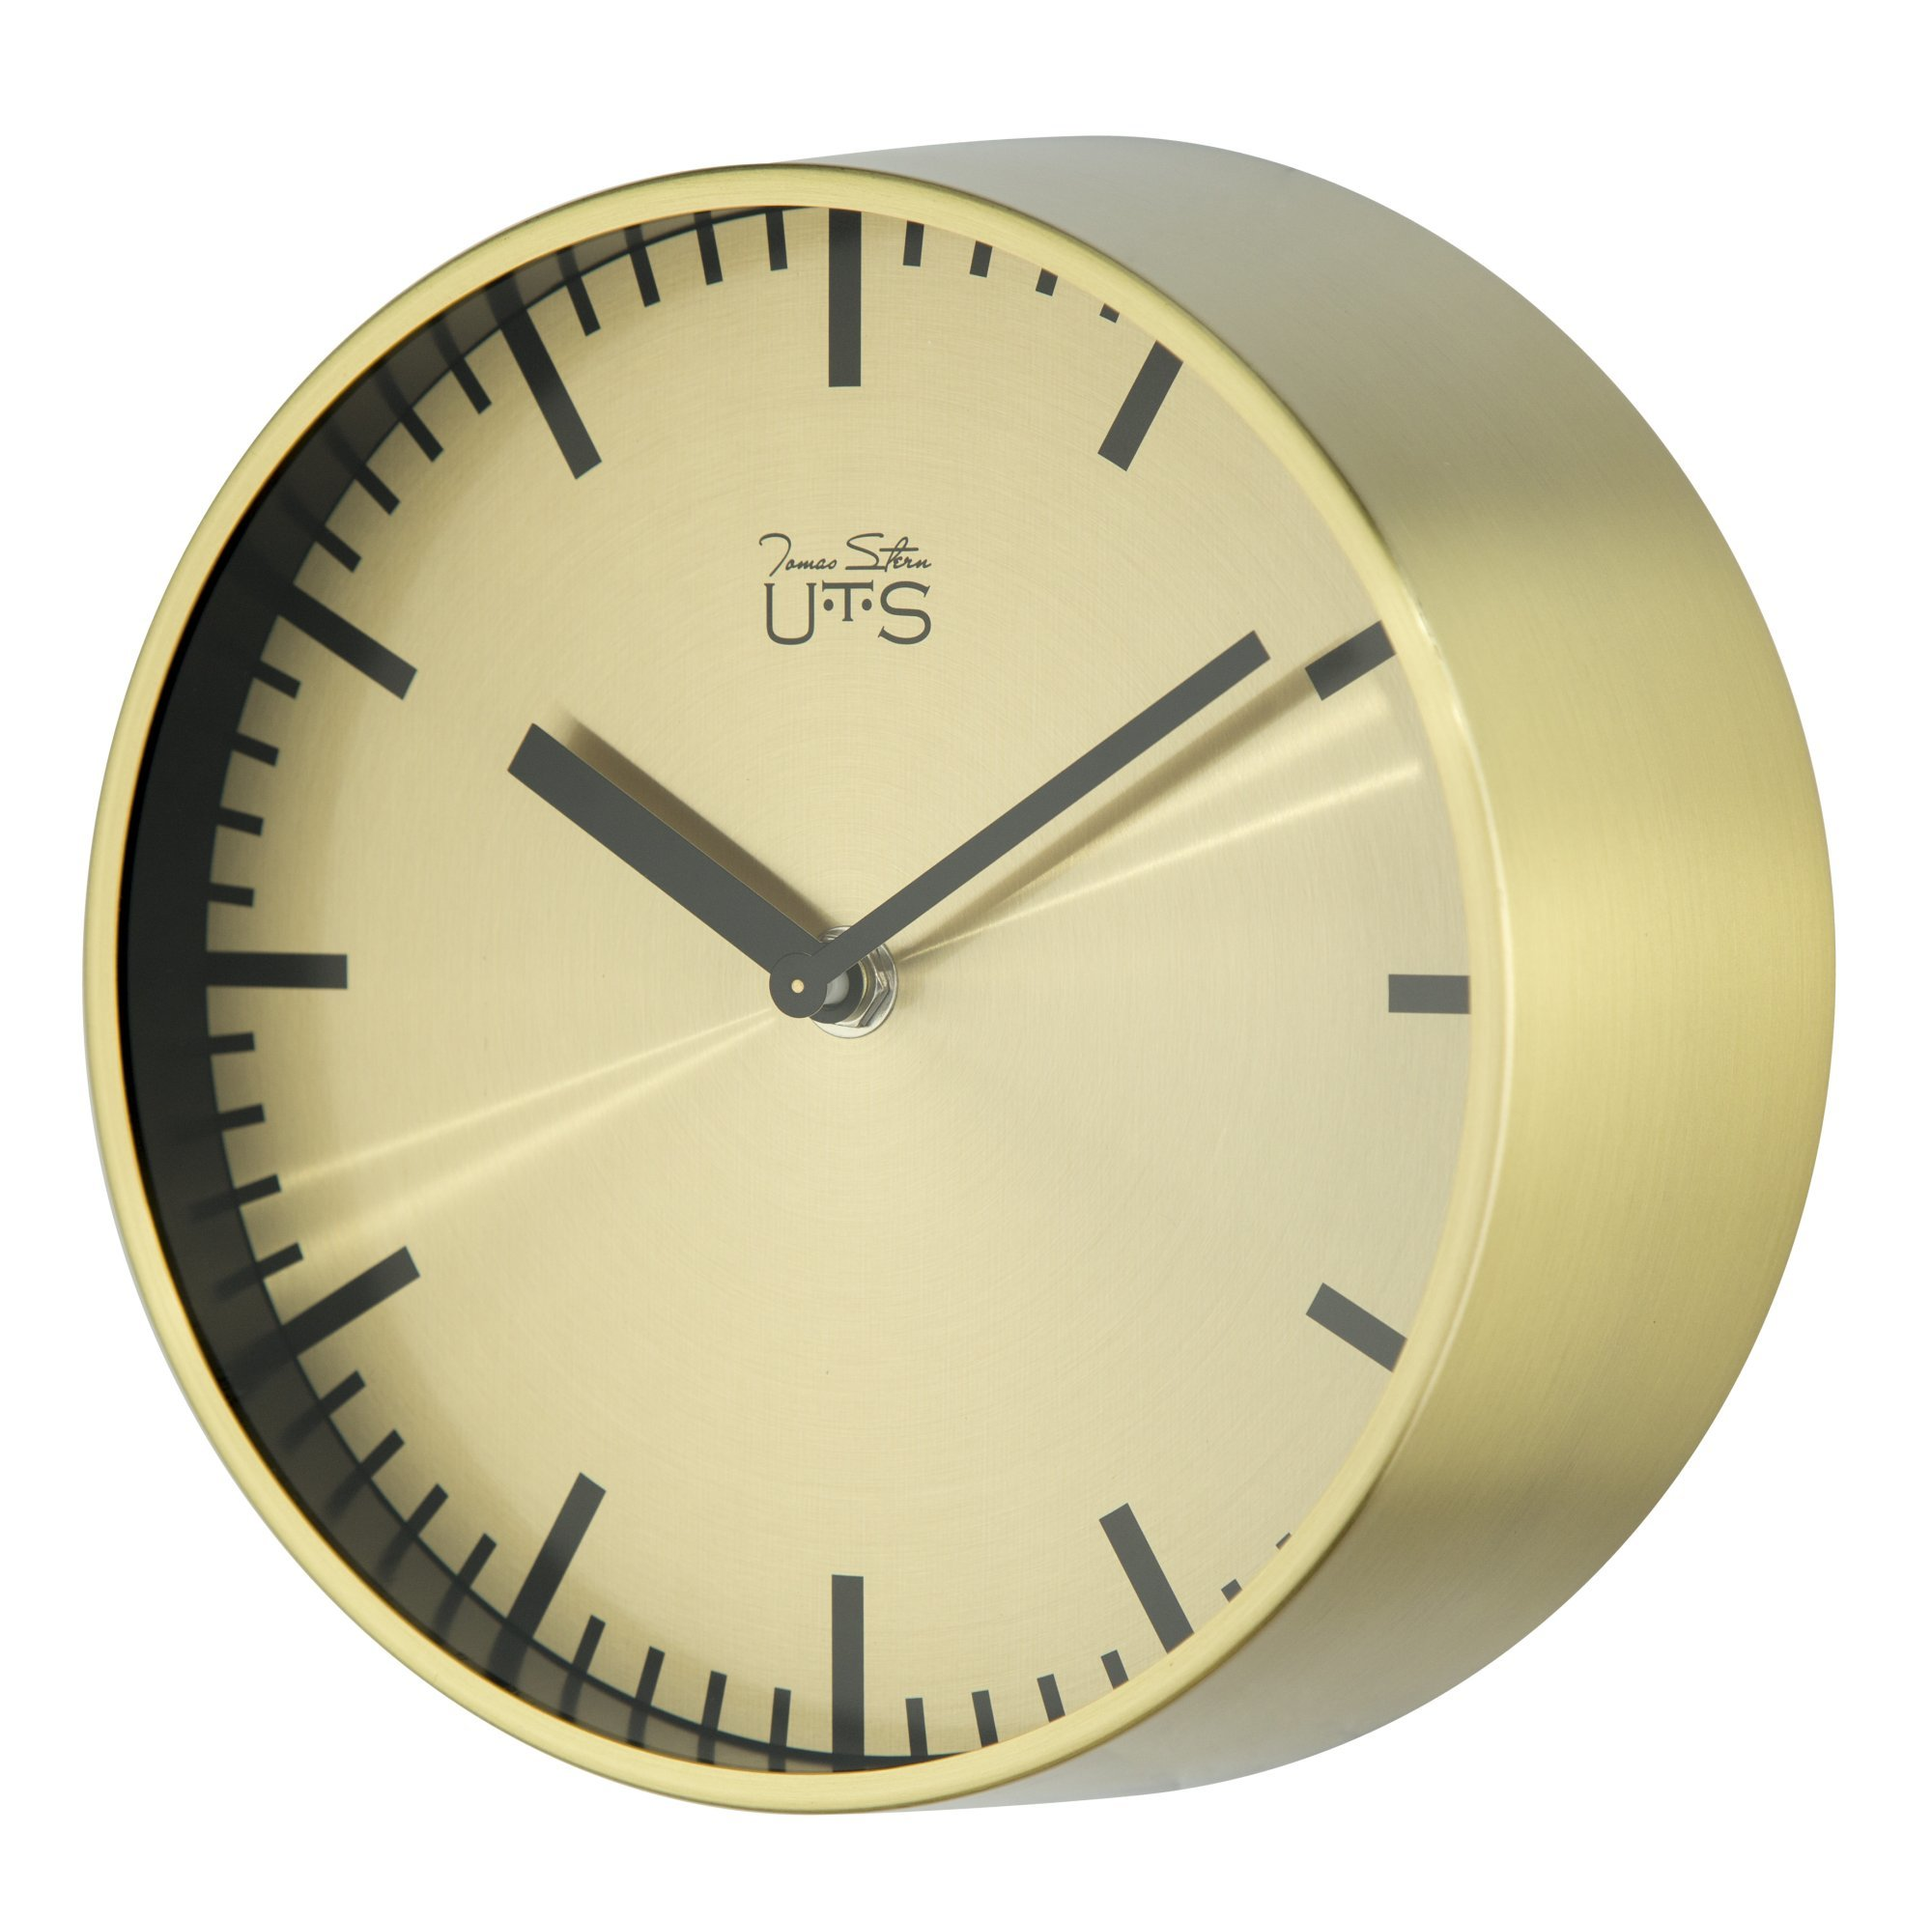 Часы настенные Часы настенные Tomas Stern 4017G chasy-nastennye-tomas-stern-4017g-germaniya.jpg